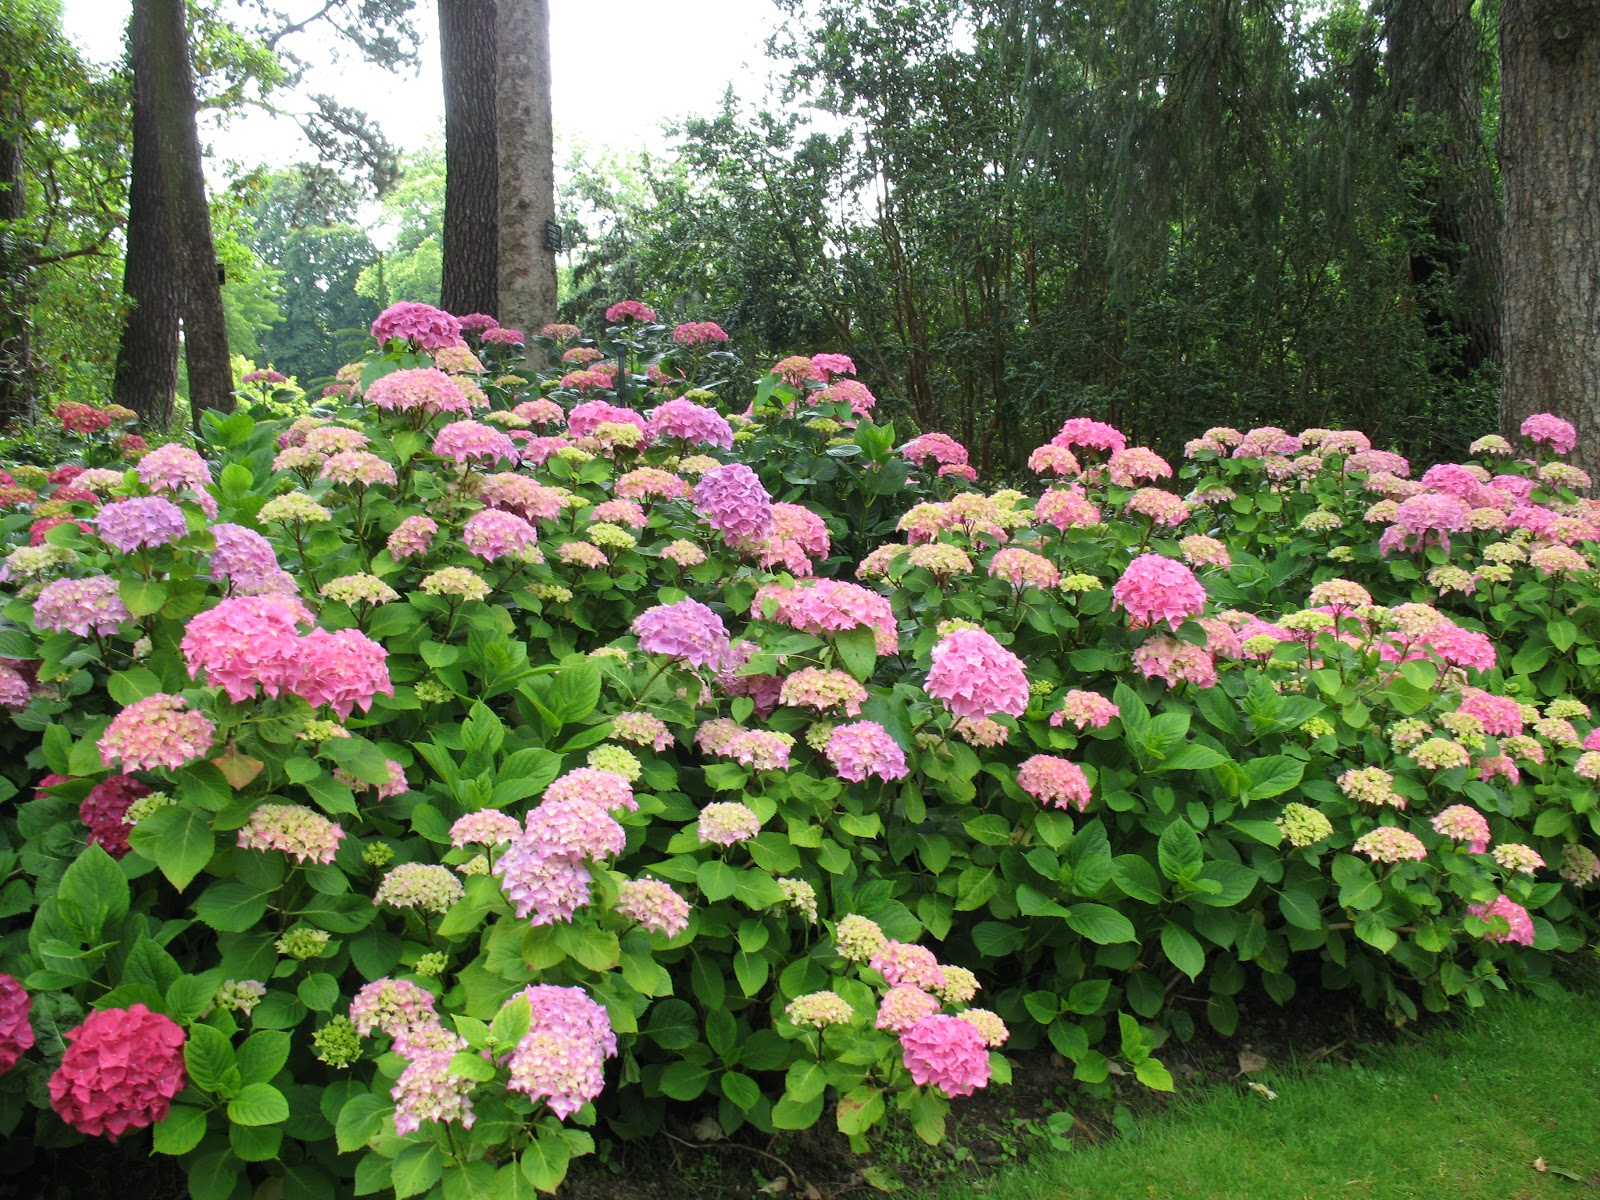 roses du jardin ch neland jardin des plantes de nantes. Black Bedroom Furniture Sets. Home Design Ideas